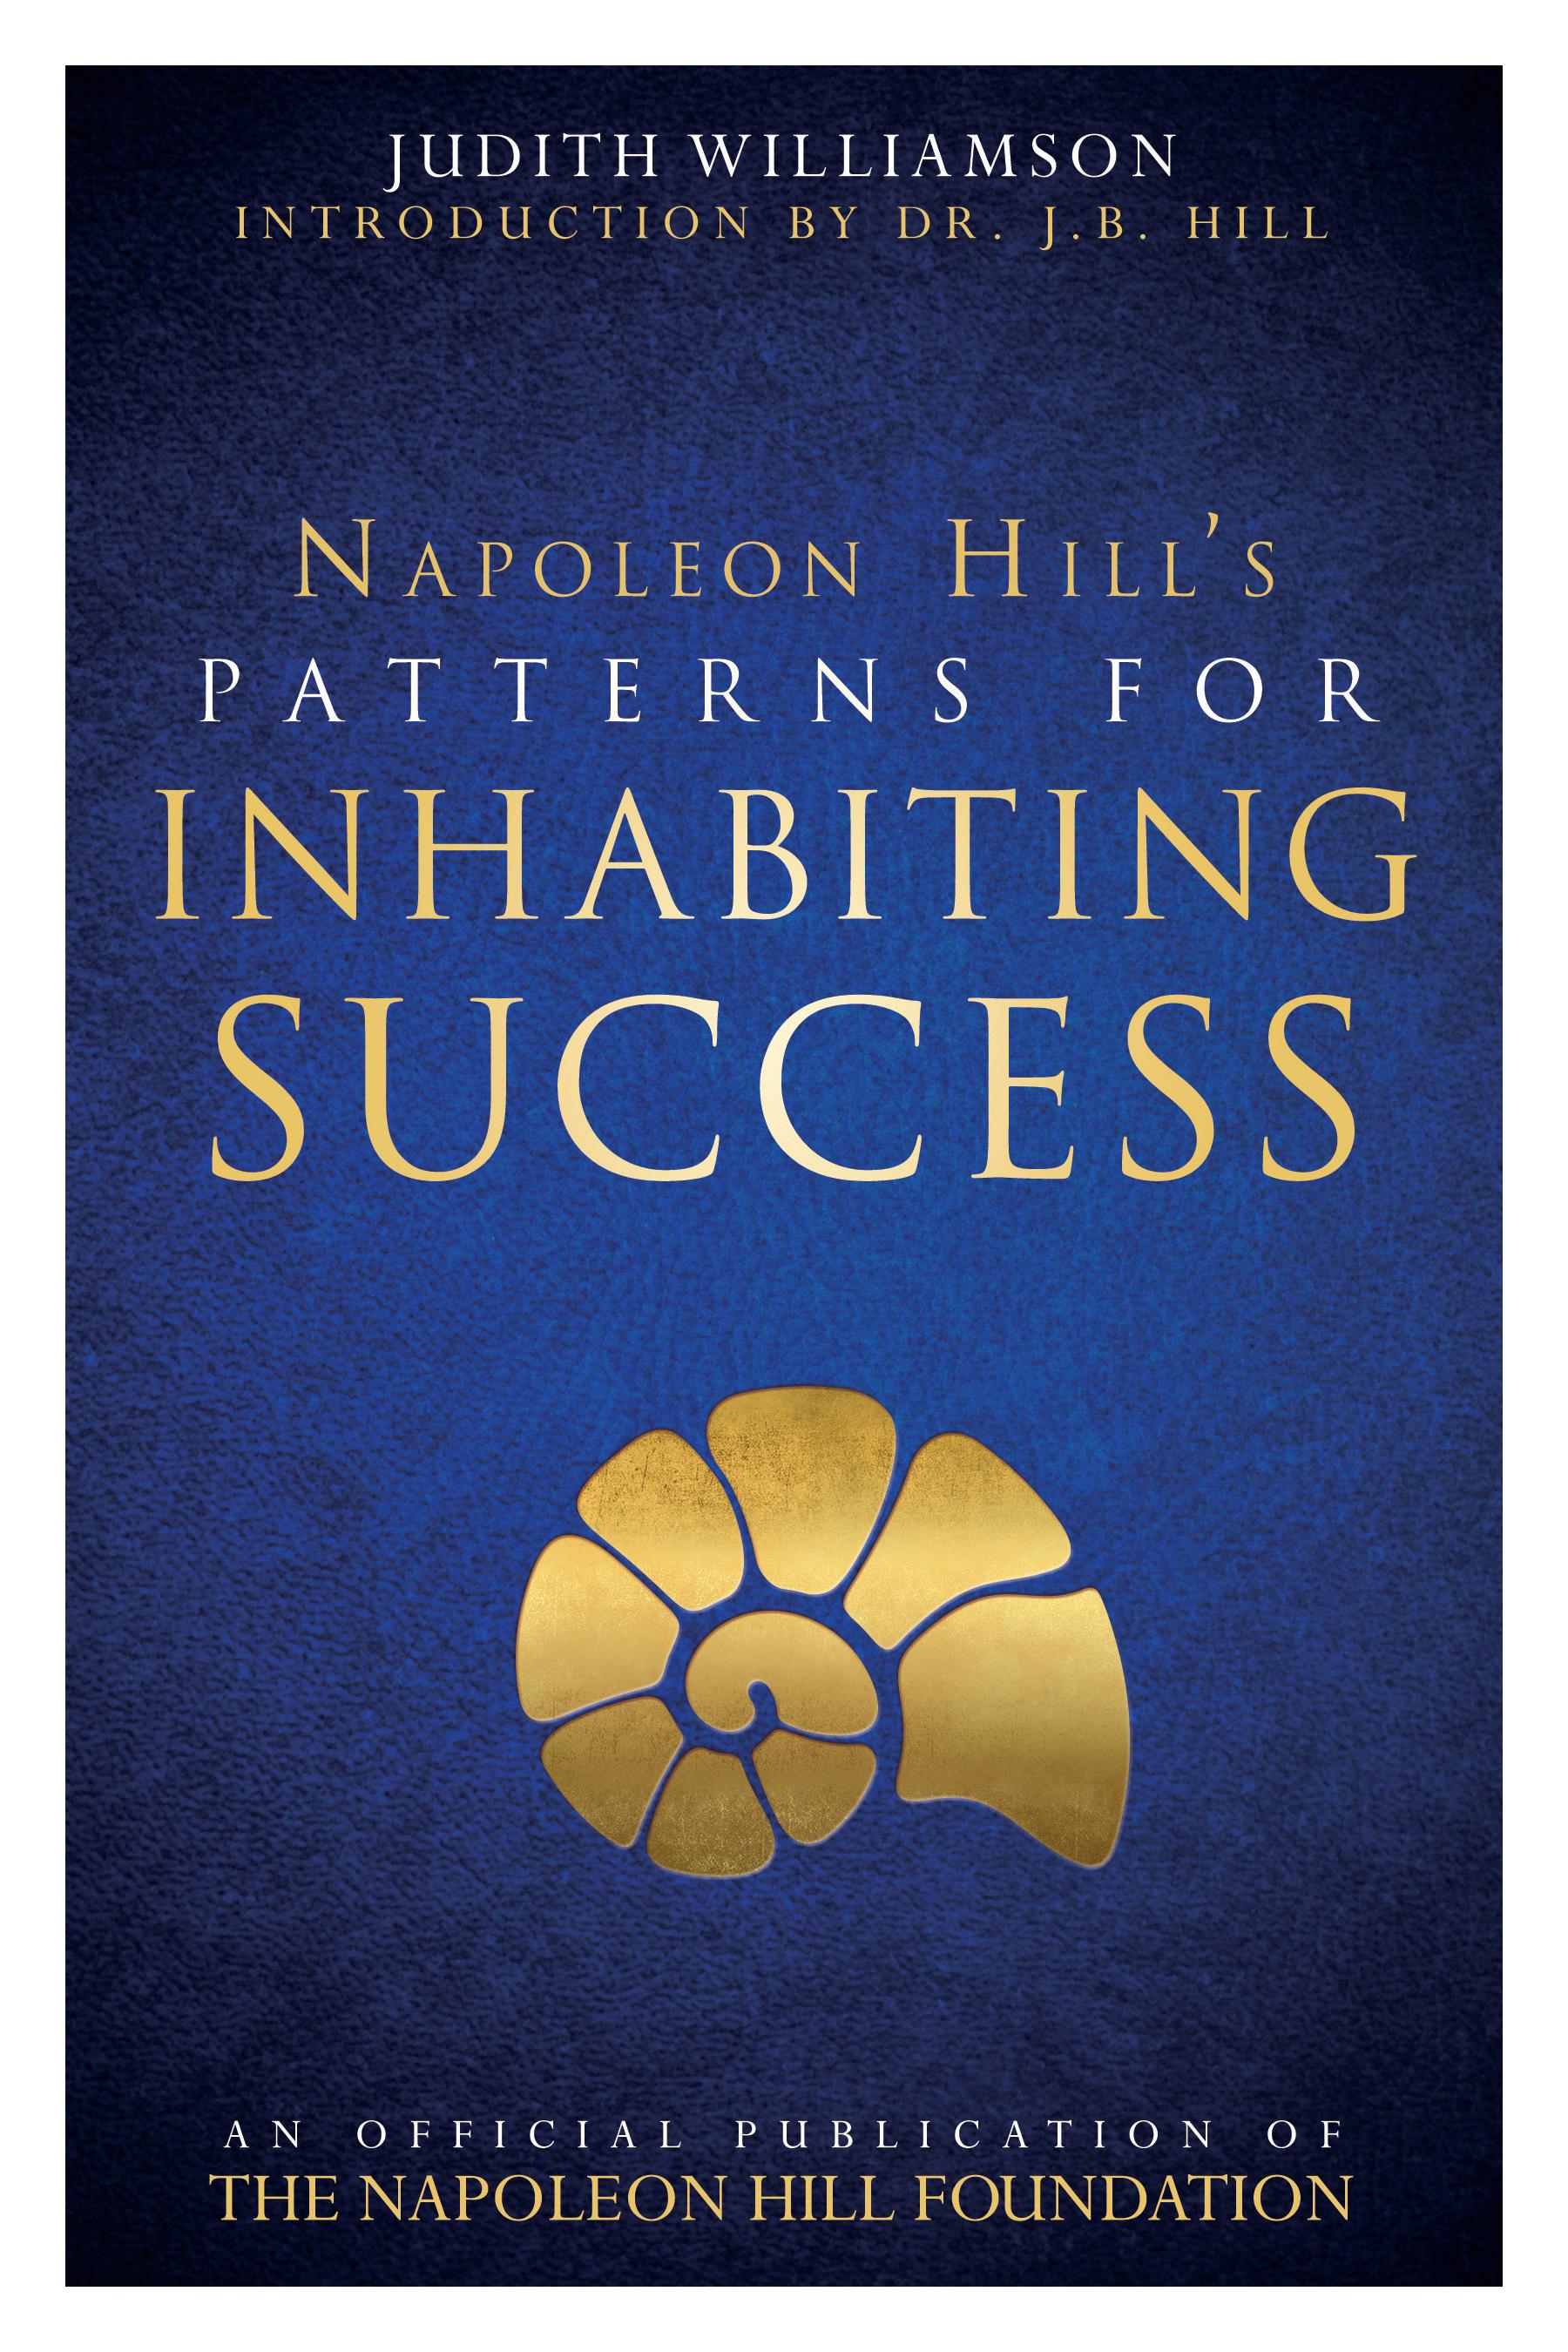 Patterns for Inhabiting Success.jpg